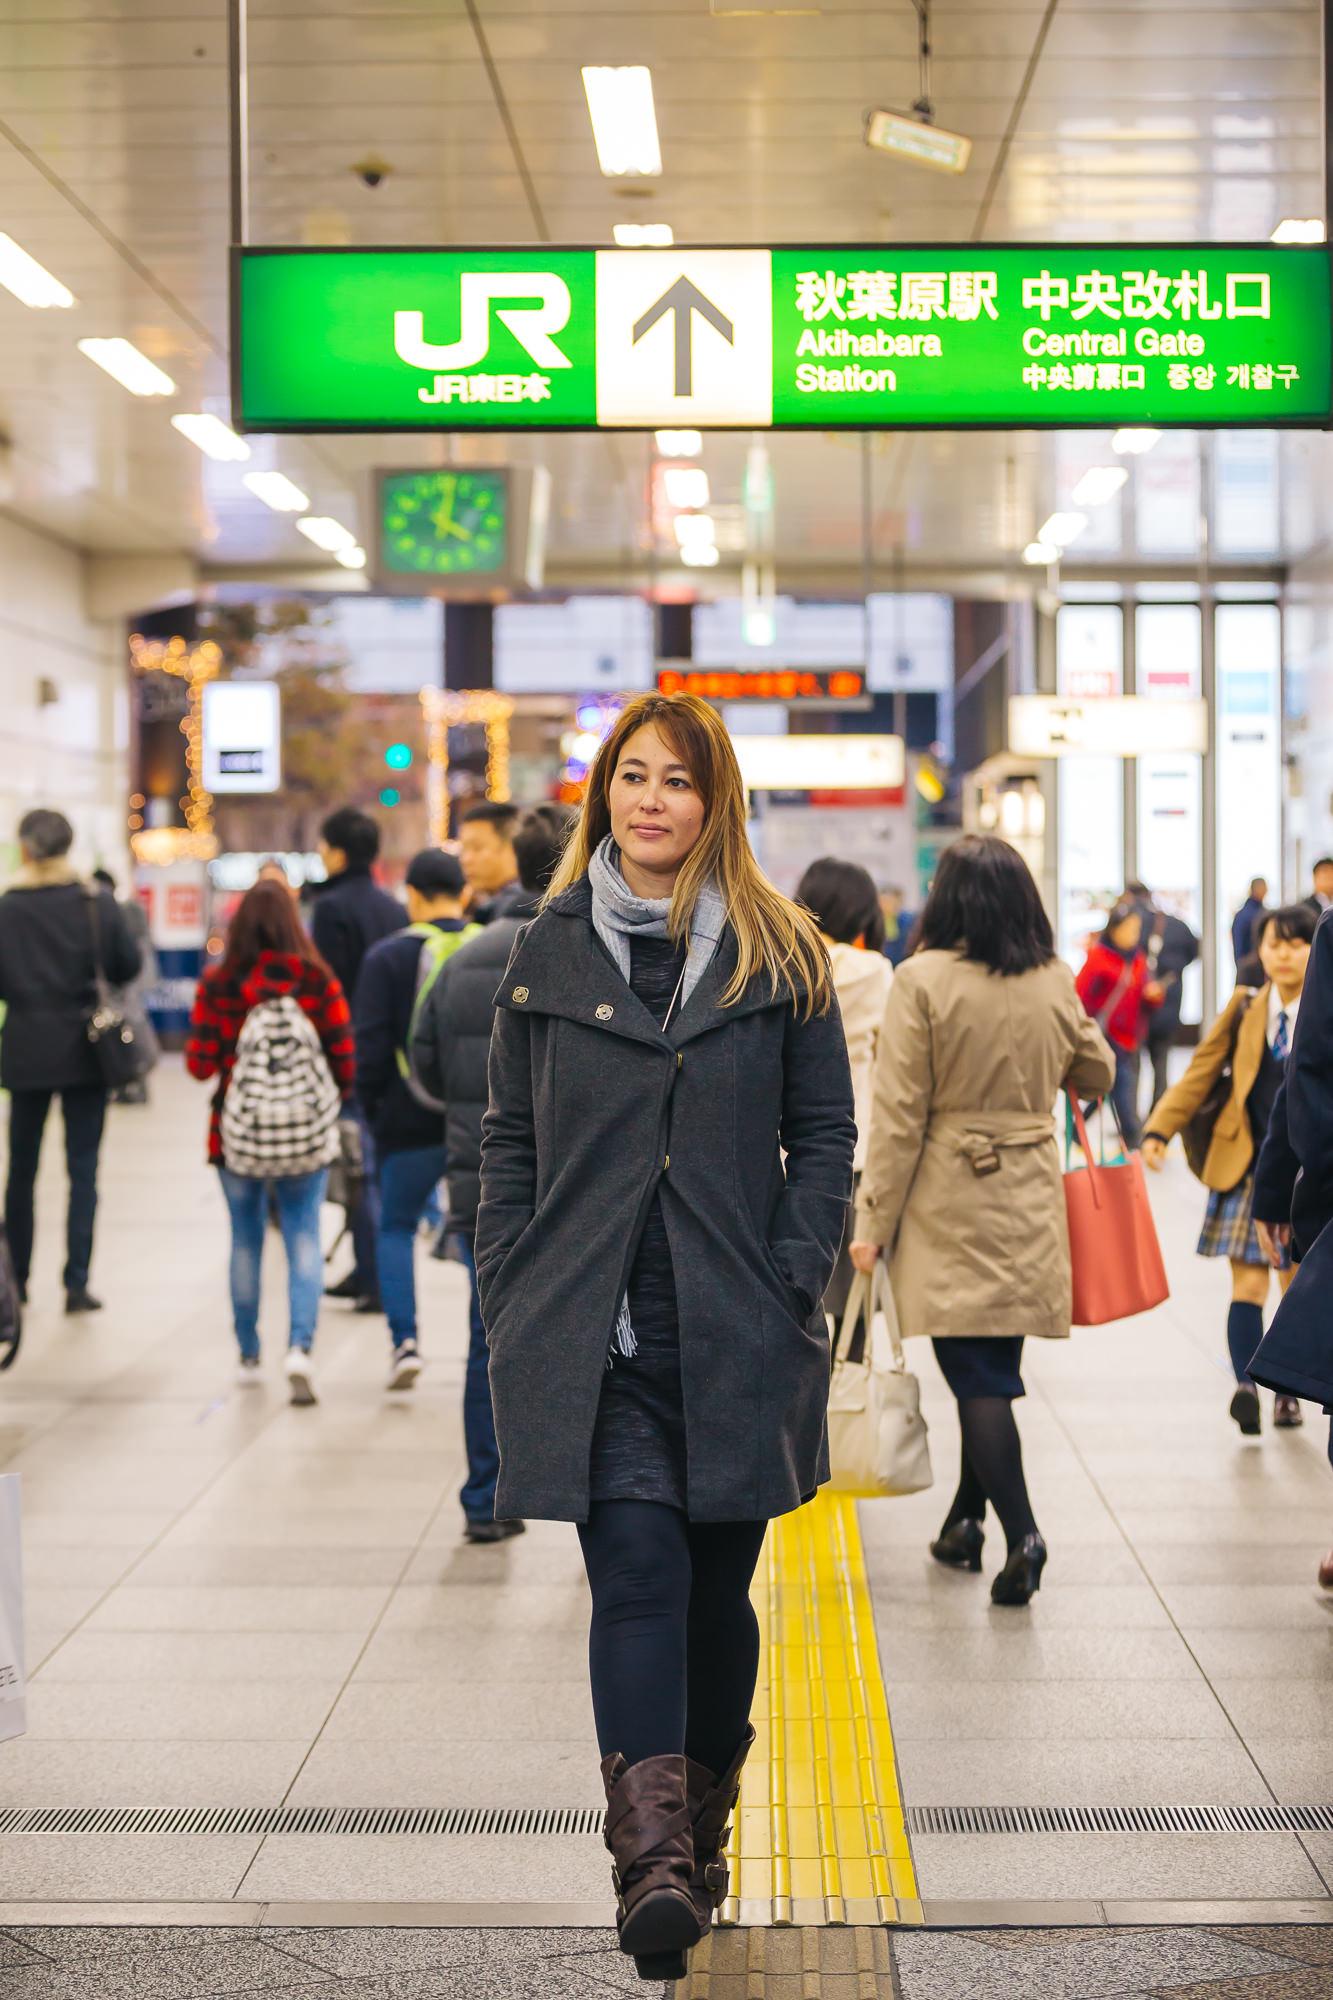 Akihabara Station, Japan.